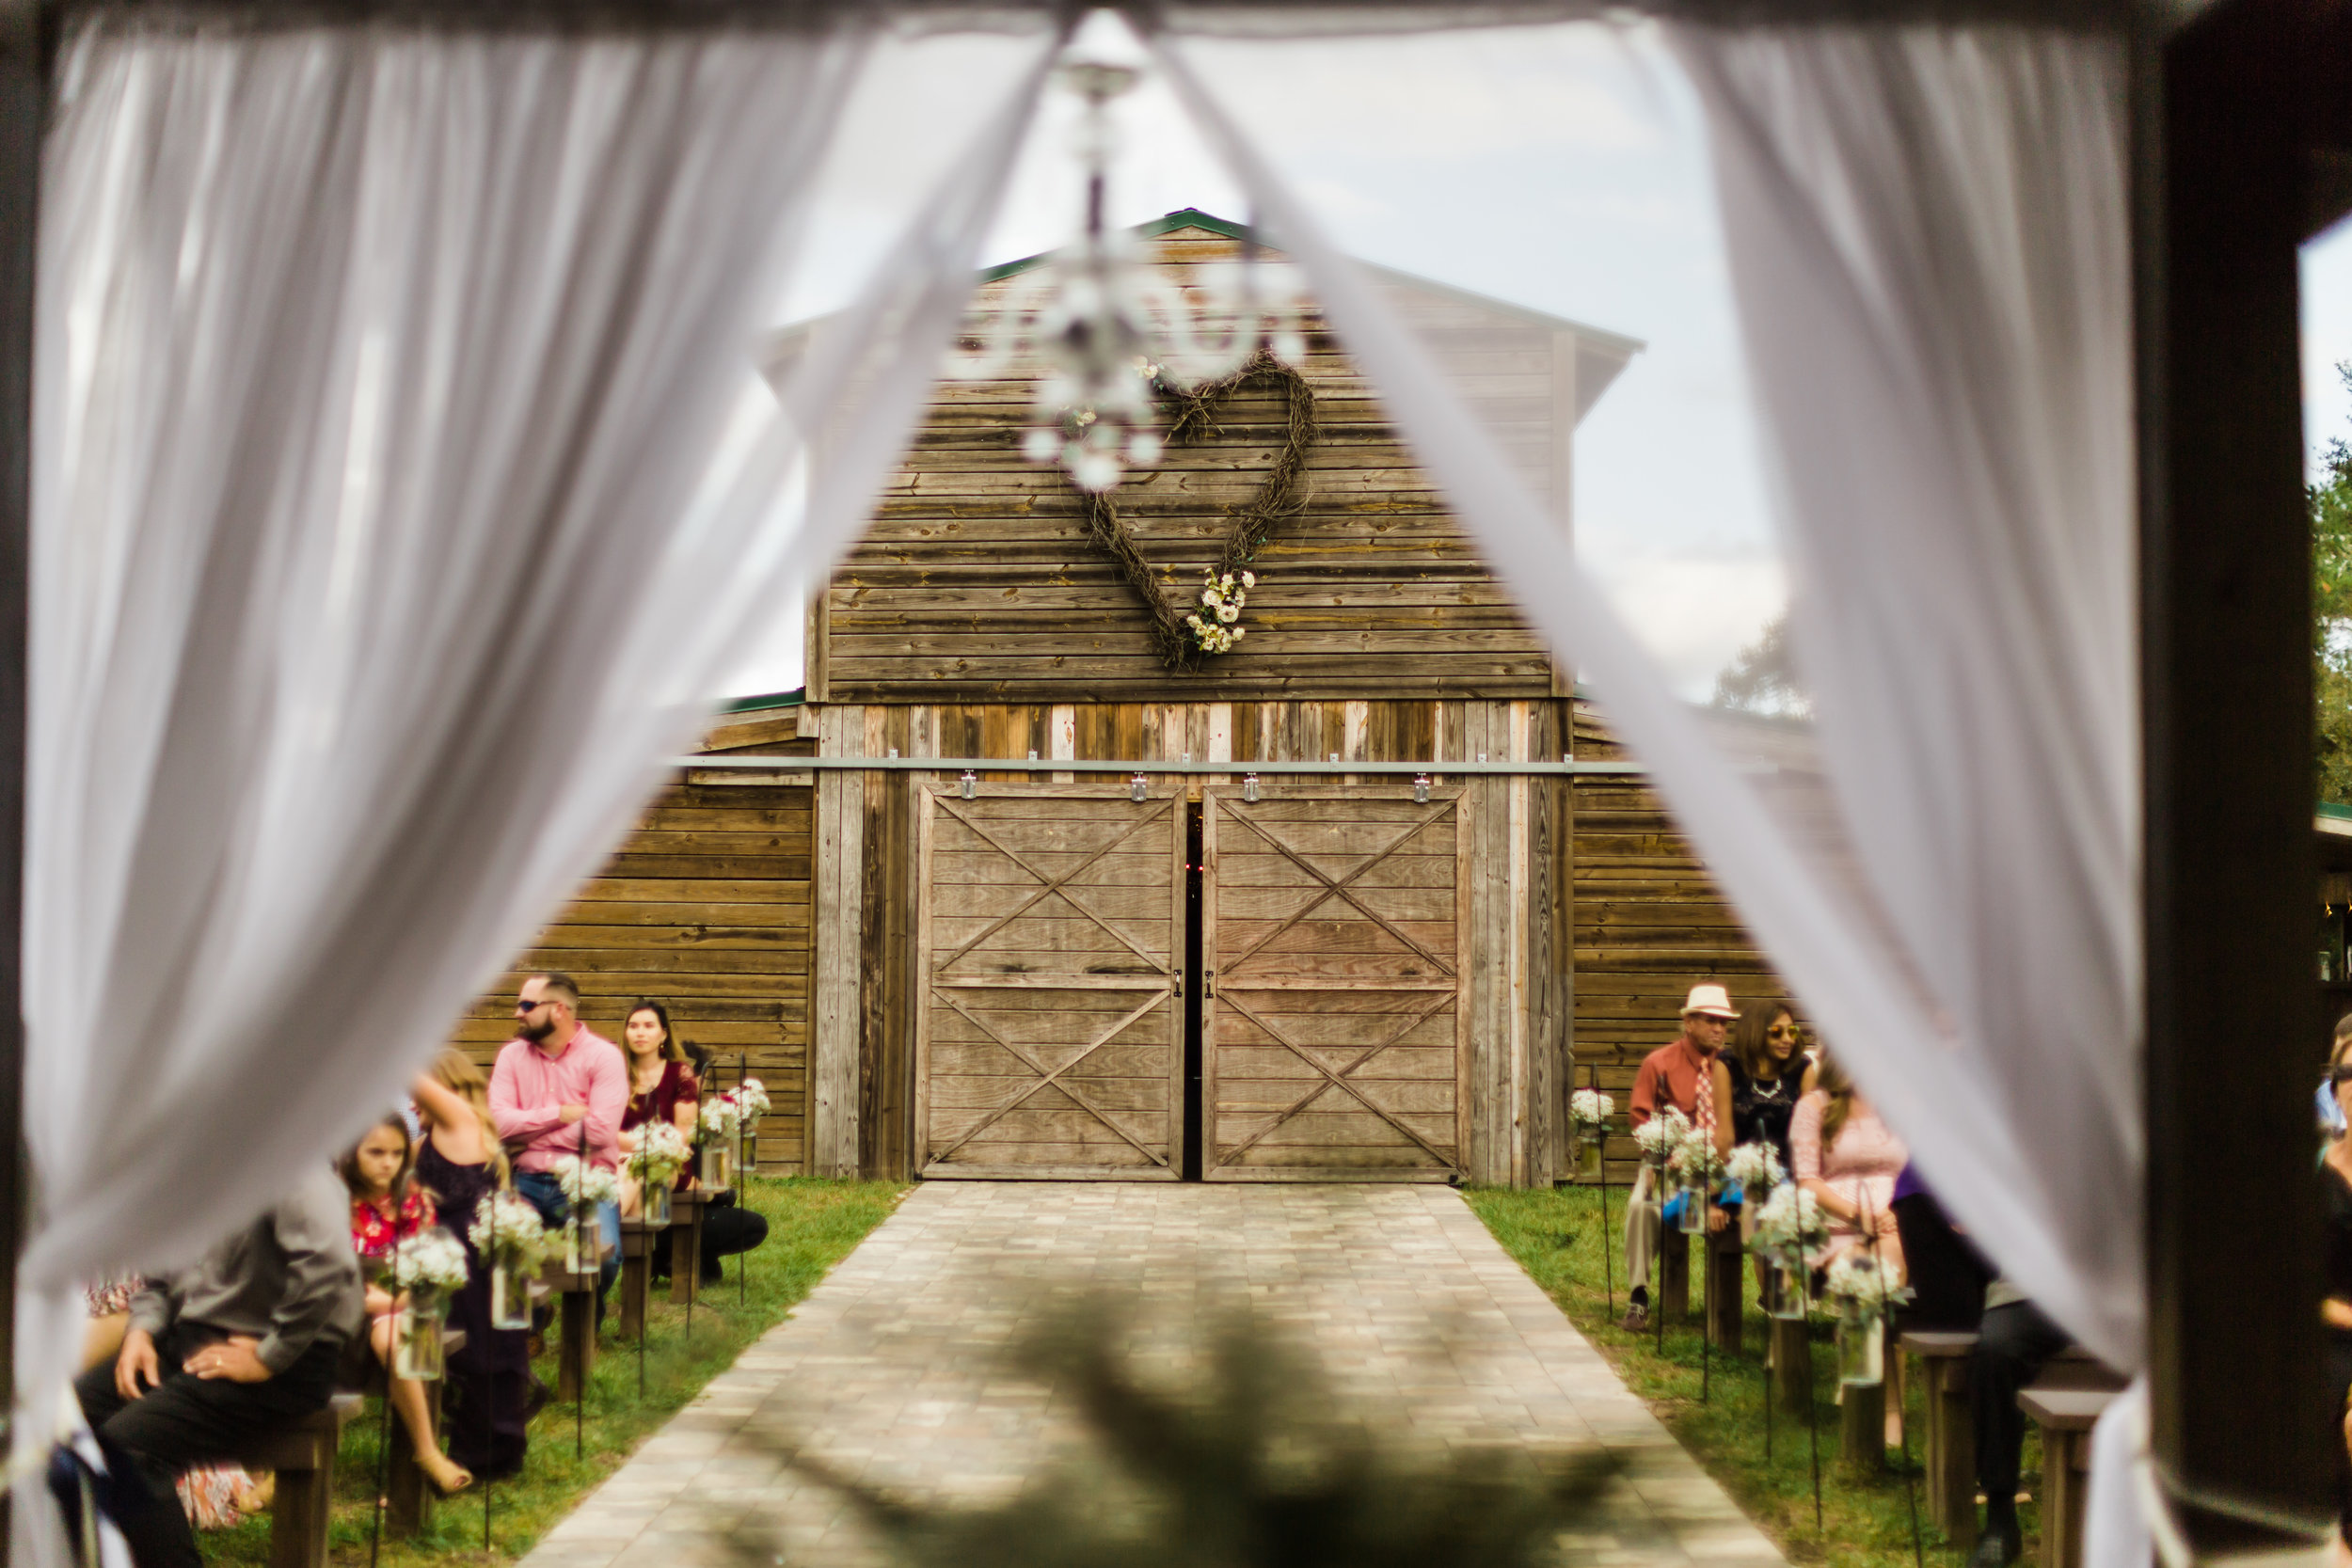 2018.11.11 Paige and TJ Enchanting Barn Wedding (135 of 841).jpg